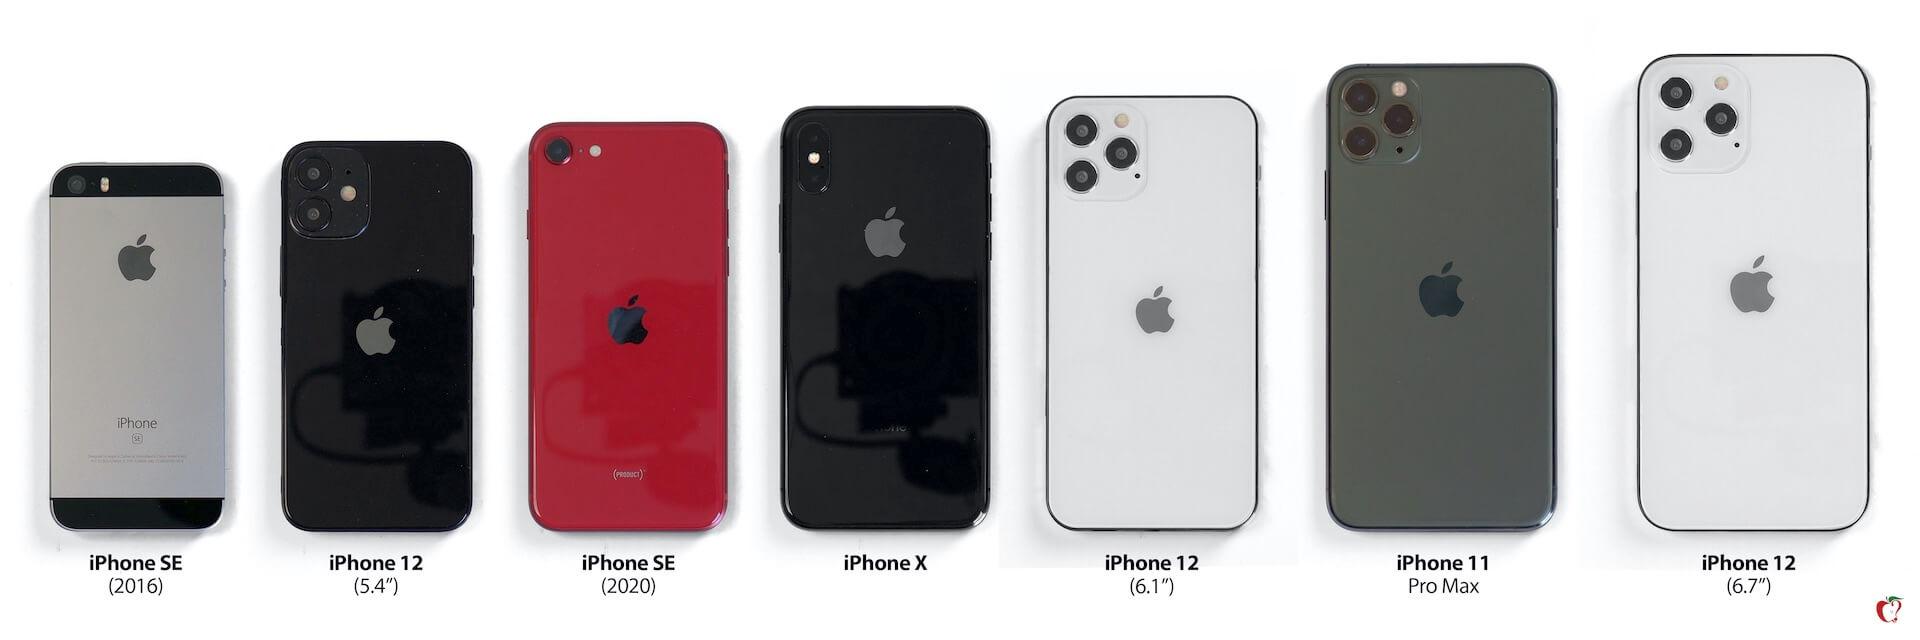 iPhone 12シリーズの全サイズのモックアップと歴代iPhoneをサイズ比較した画像が公開! tech200708_iphone12_mockup_2-1